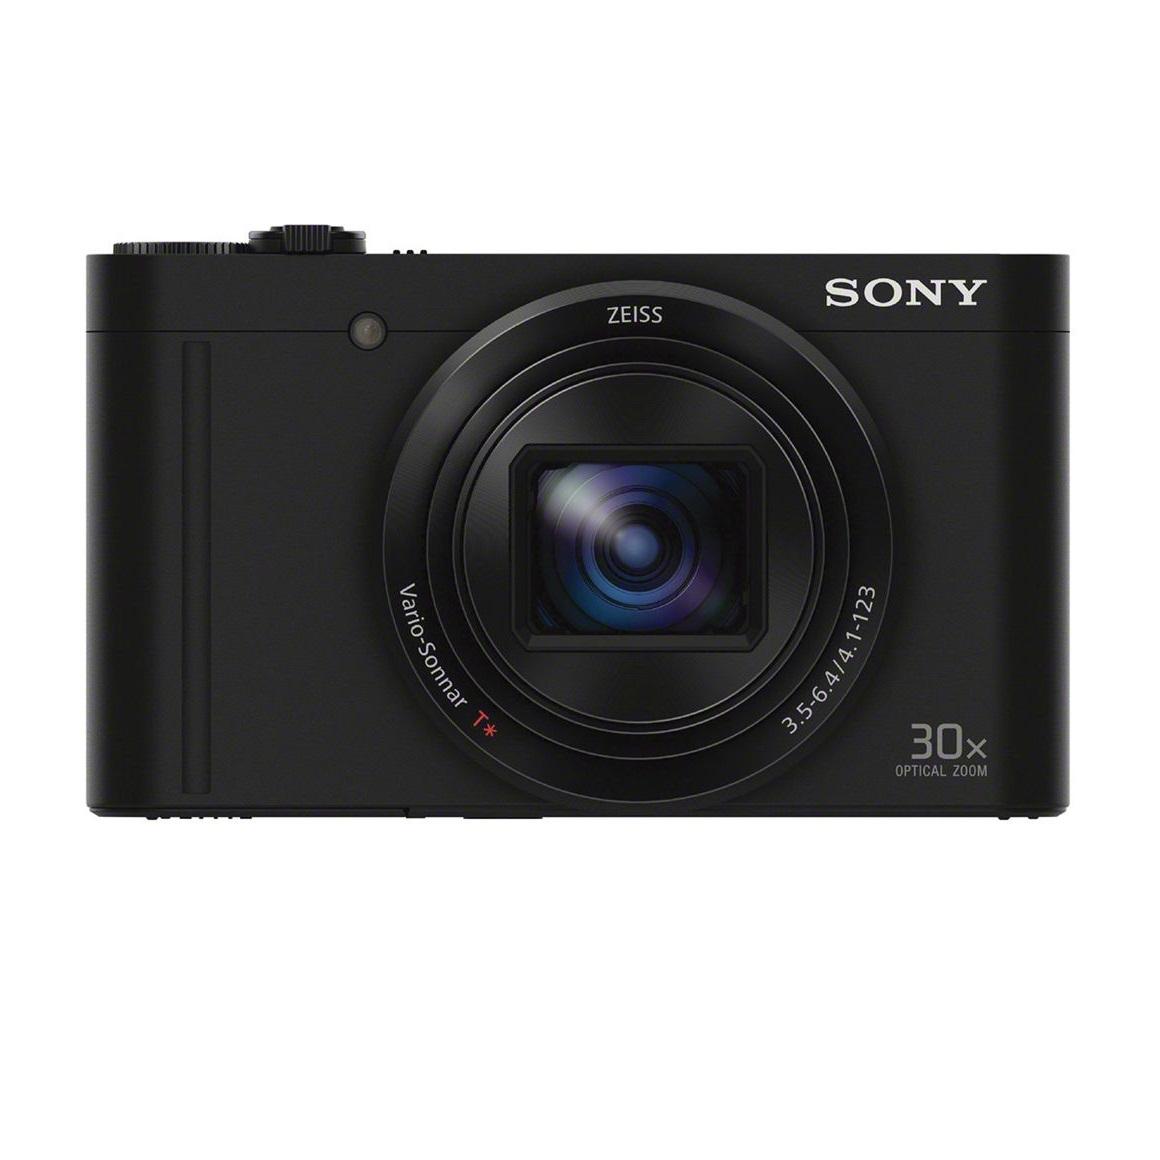 Máy ảnh KTS Sony CyberShot DSC-WX500 - Đen